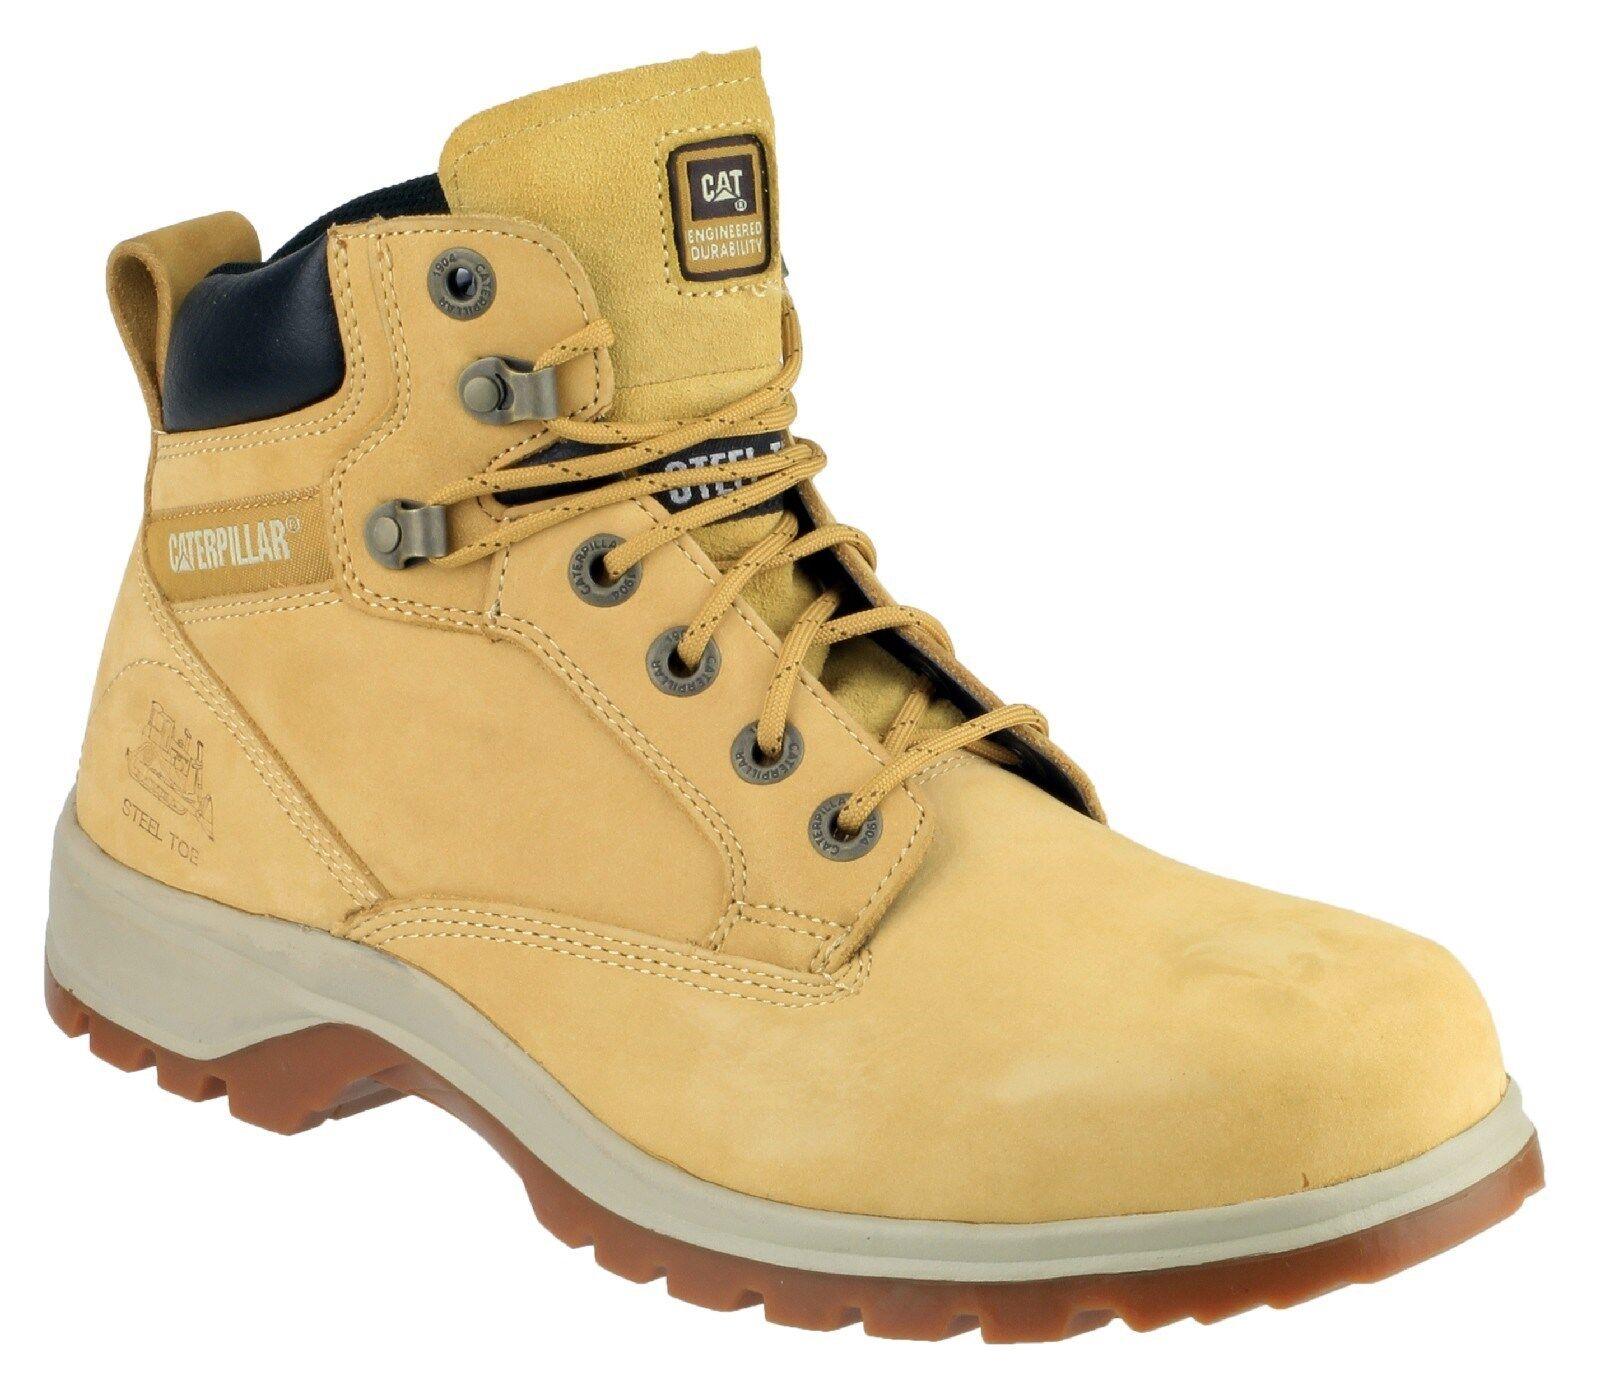 Cat caterpillar kitson safety boots steel toecap hiker womens